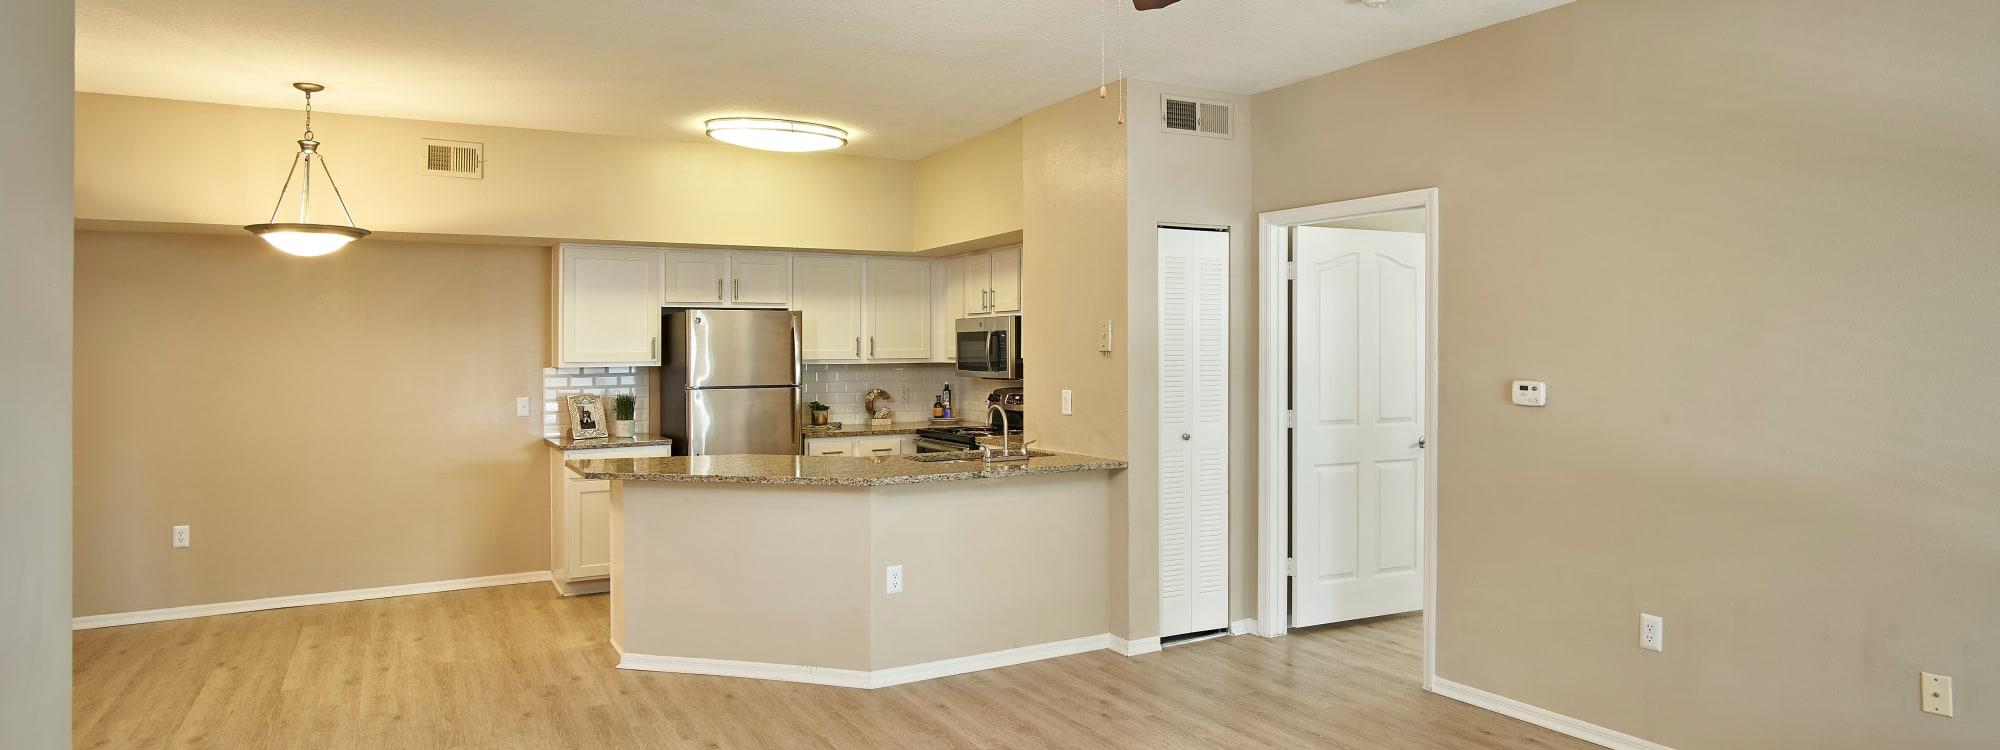 Floor plans at Calais Park Apartments in St Petersburg, Florida